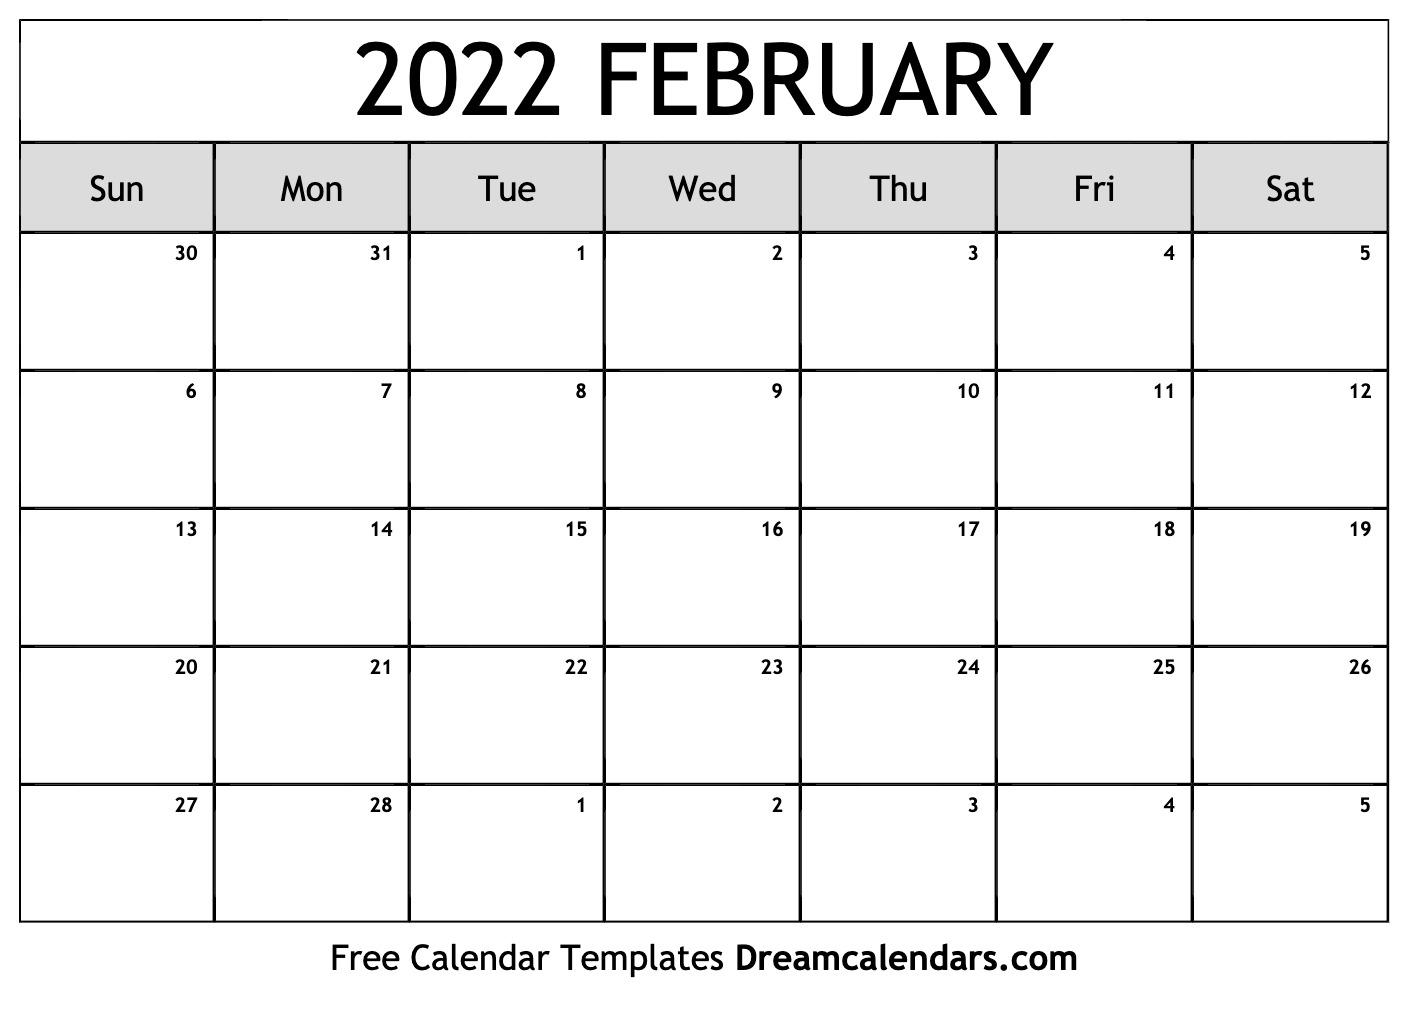 February 2022 Calendar | Free Blank Printable Templates In Fillable February 2022 Calendar